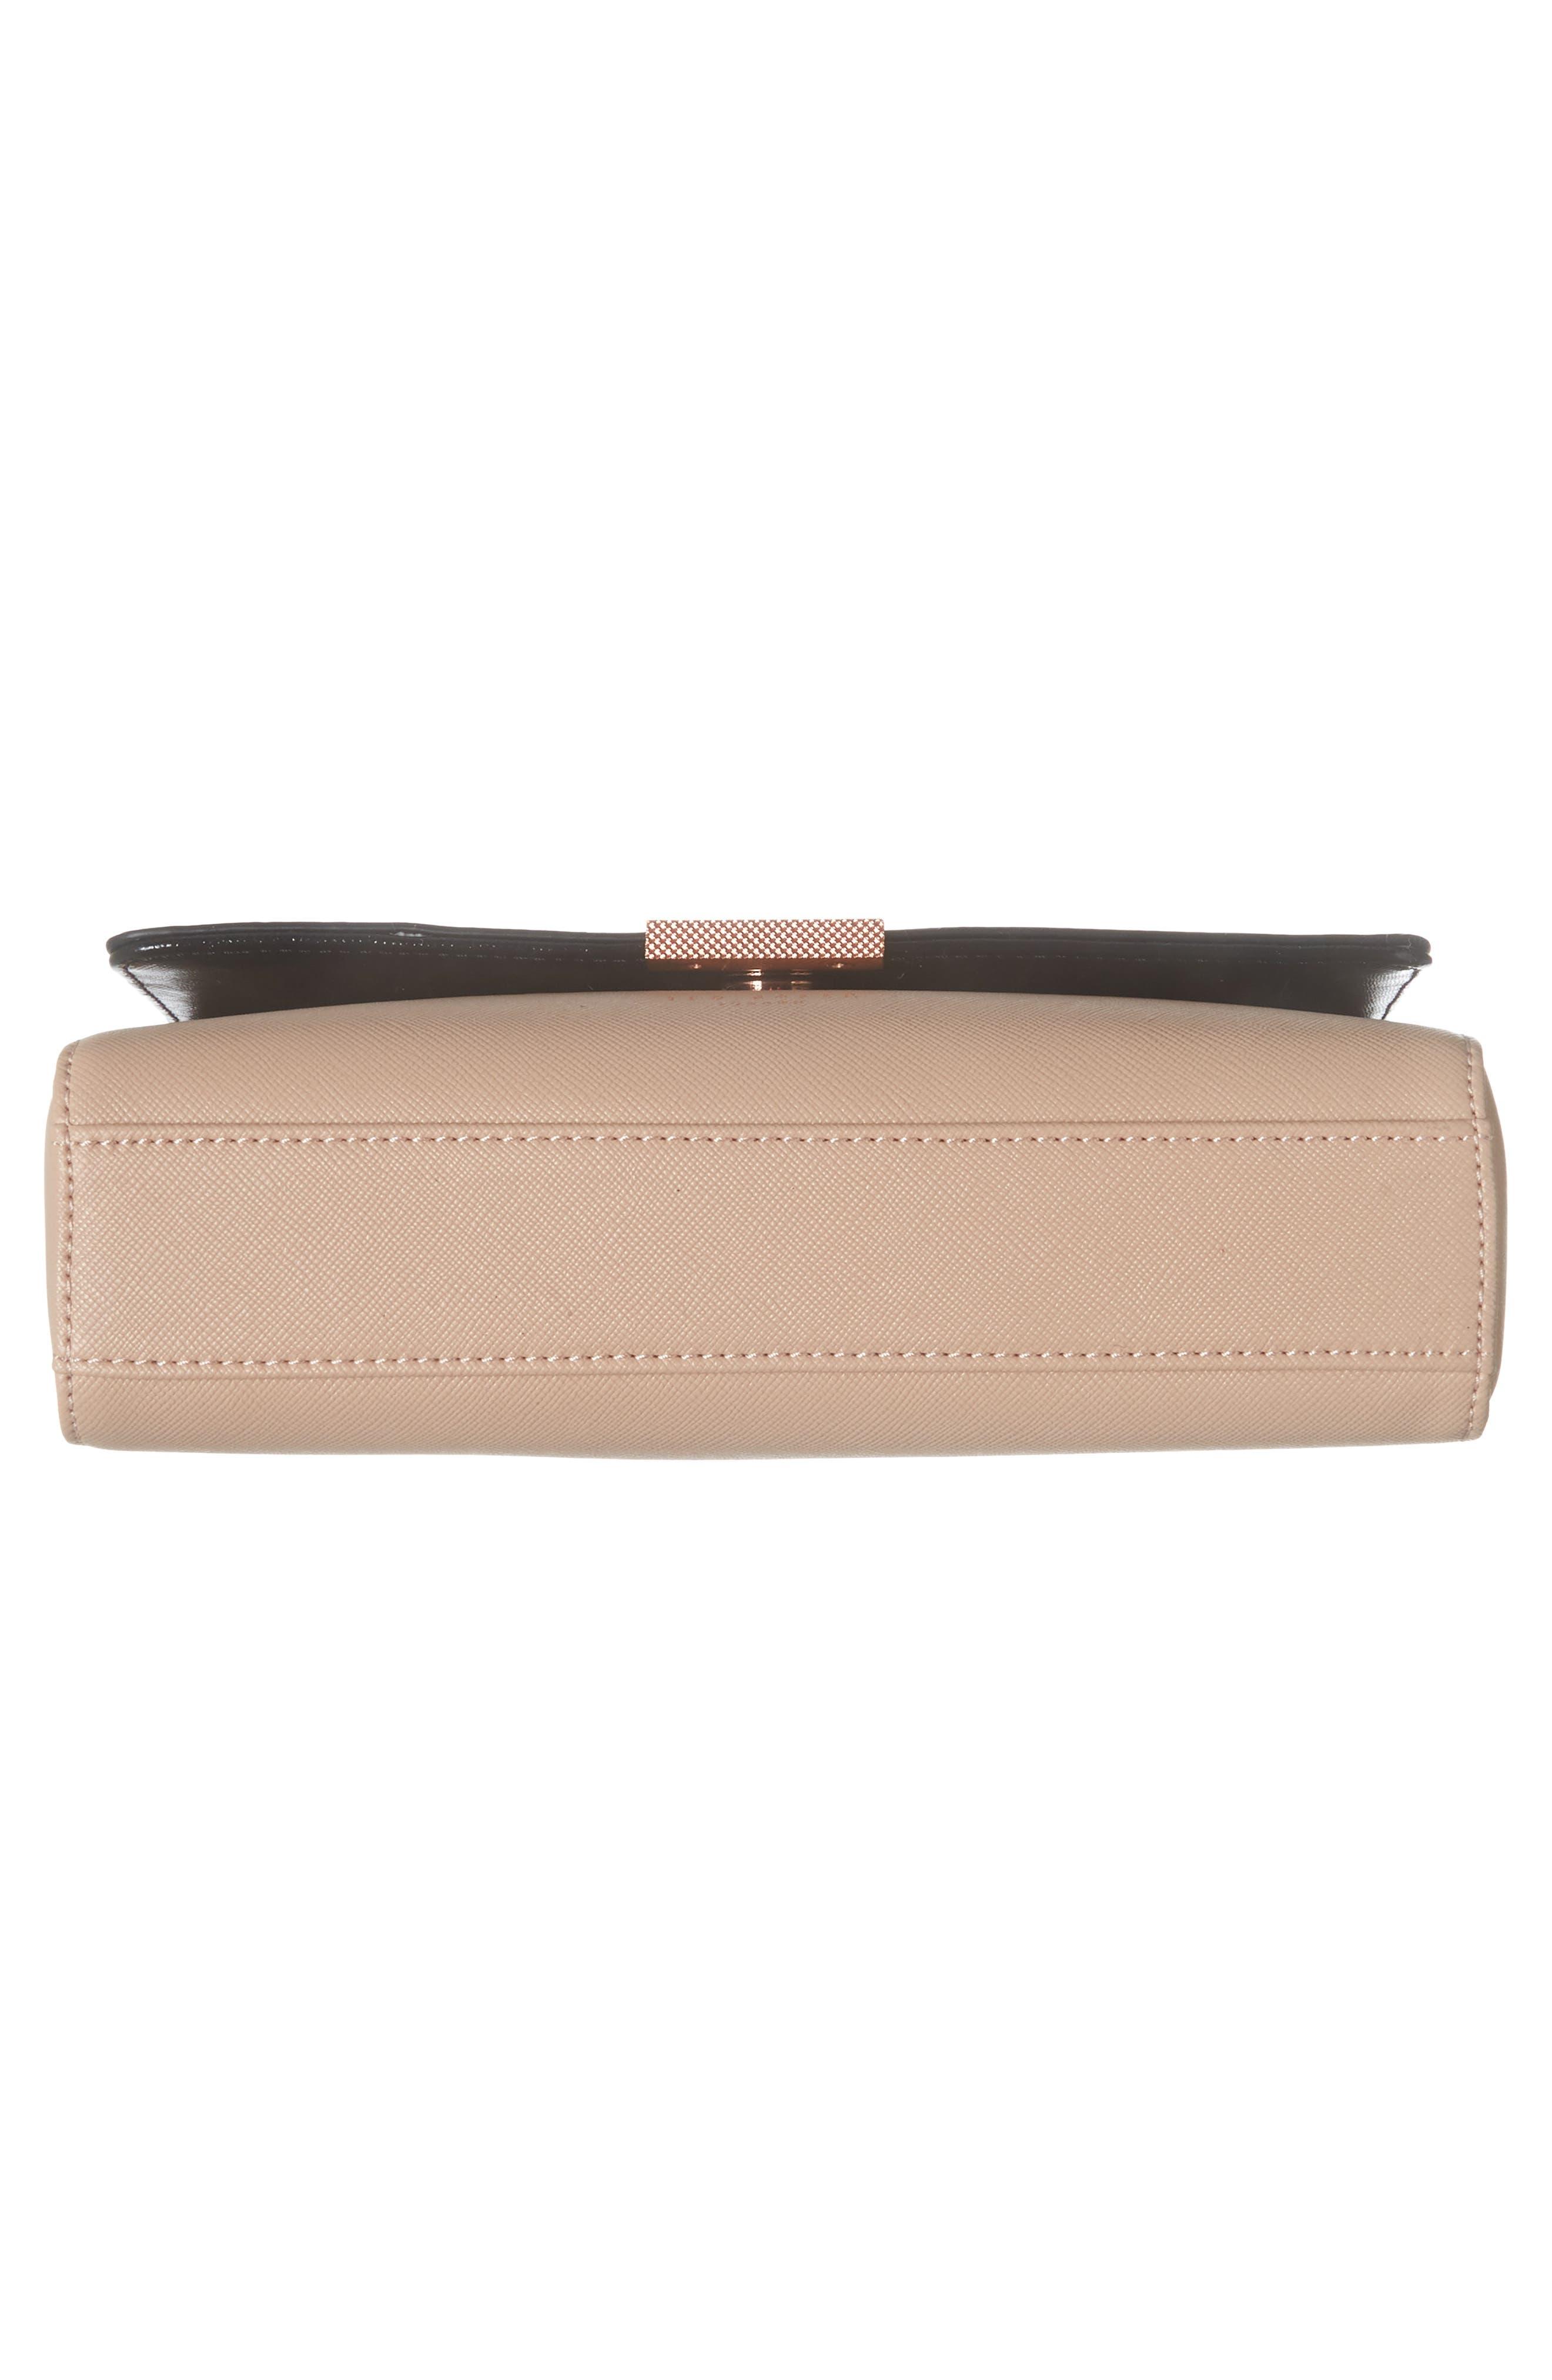 Demonda Faux Leather Crossbody Bag,                             Alternate thumbnail 6, color,                             Taupe